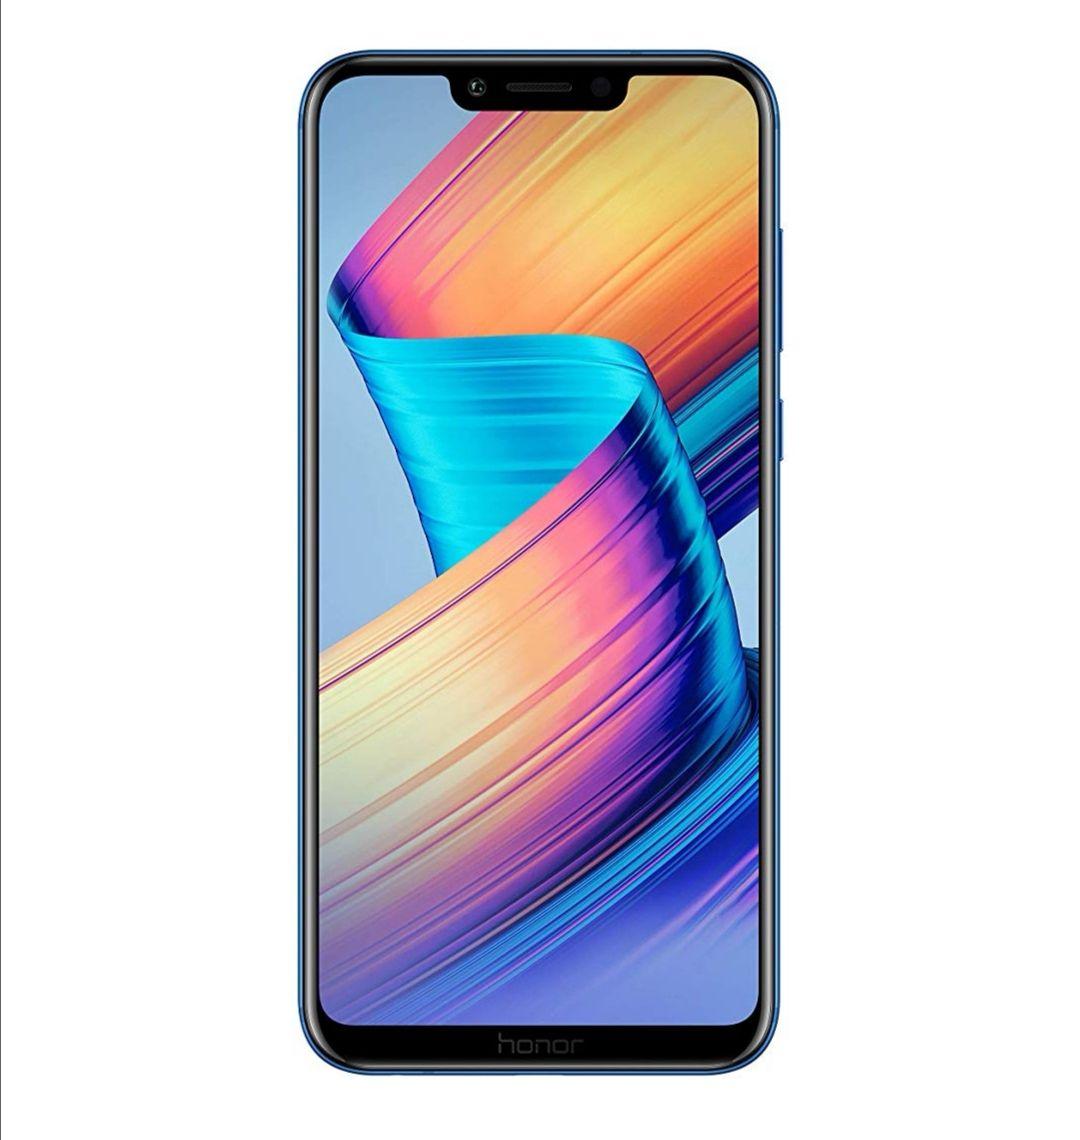 Honor Play Dual SIM, 64 GB storage, 16 MP Dual Camera and 6.3 Inch Full View Display - Blue £181.99 @ Livewire Telecom / Amazon